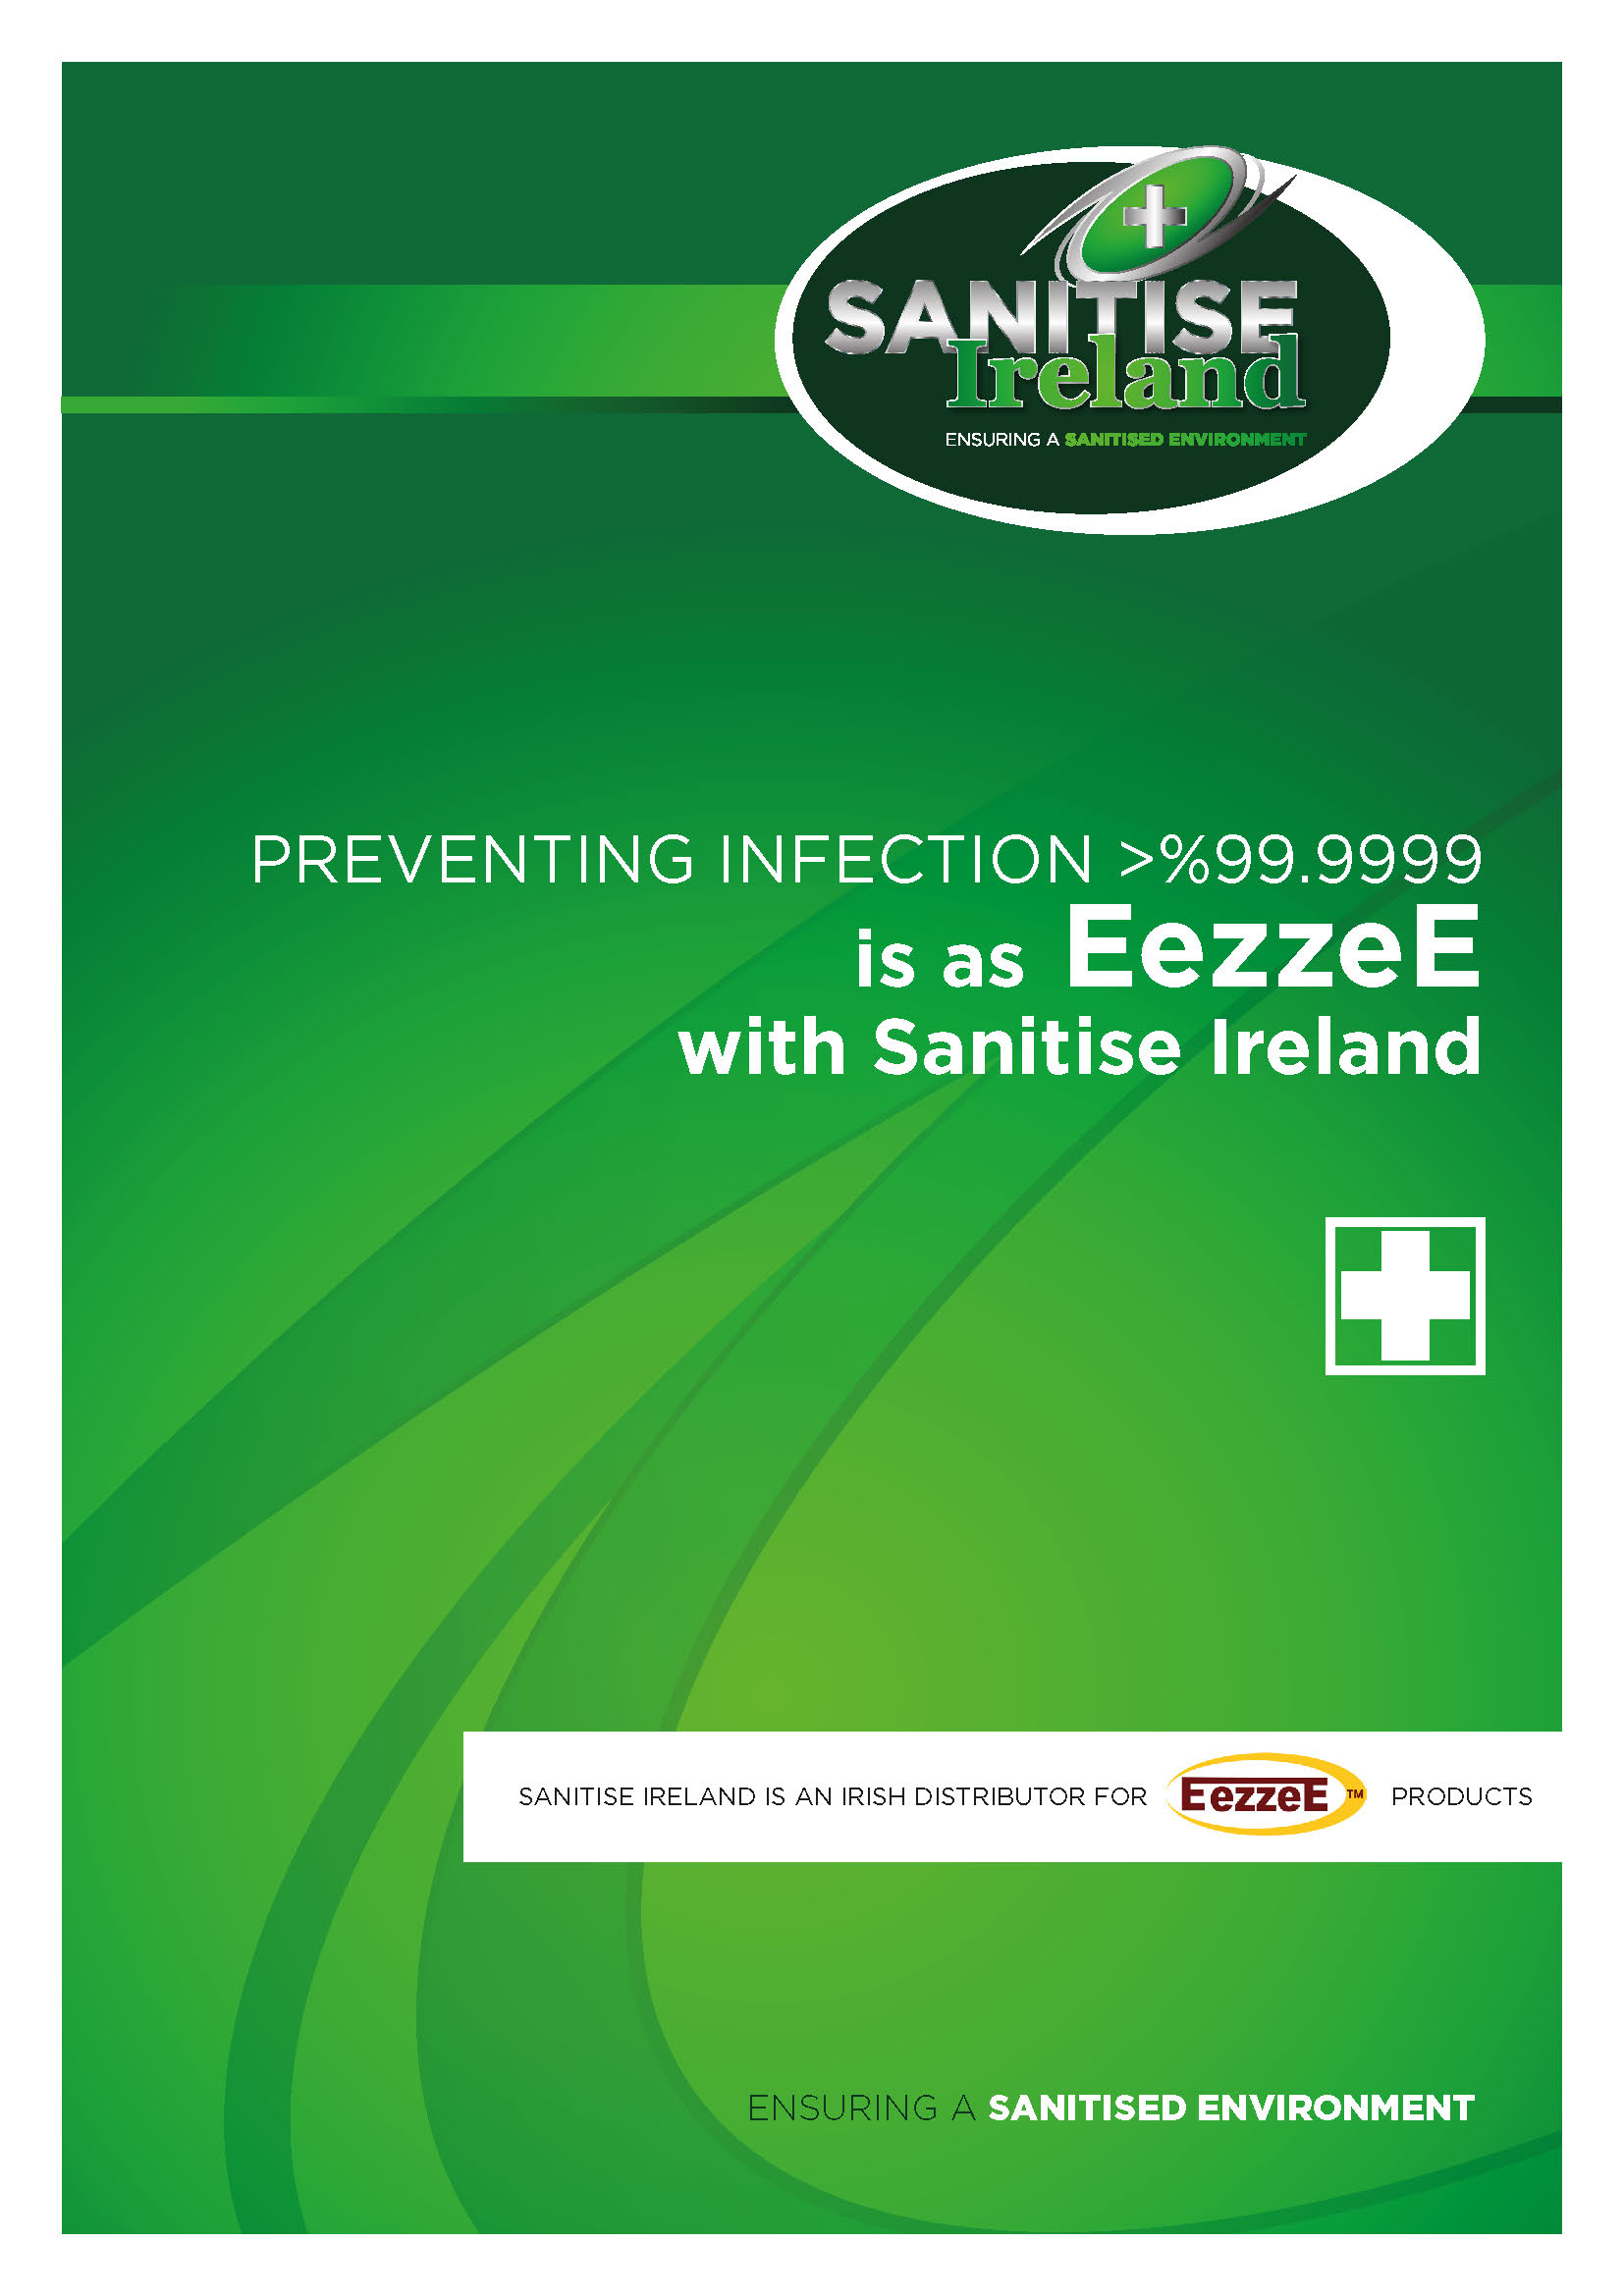 Sanitise-Ireland-EezeE-Healthcare-document_Page_01